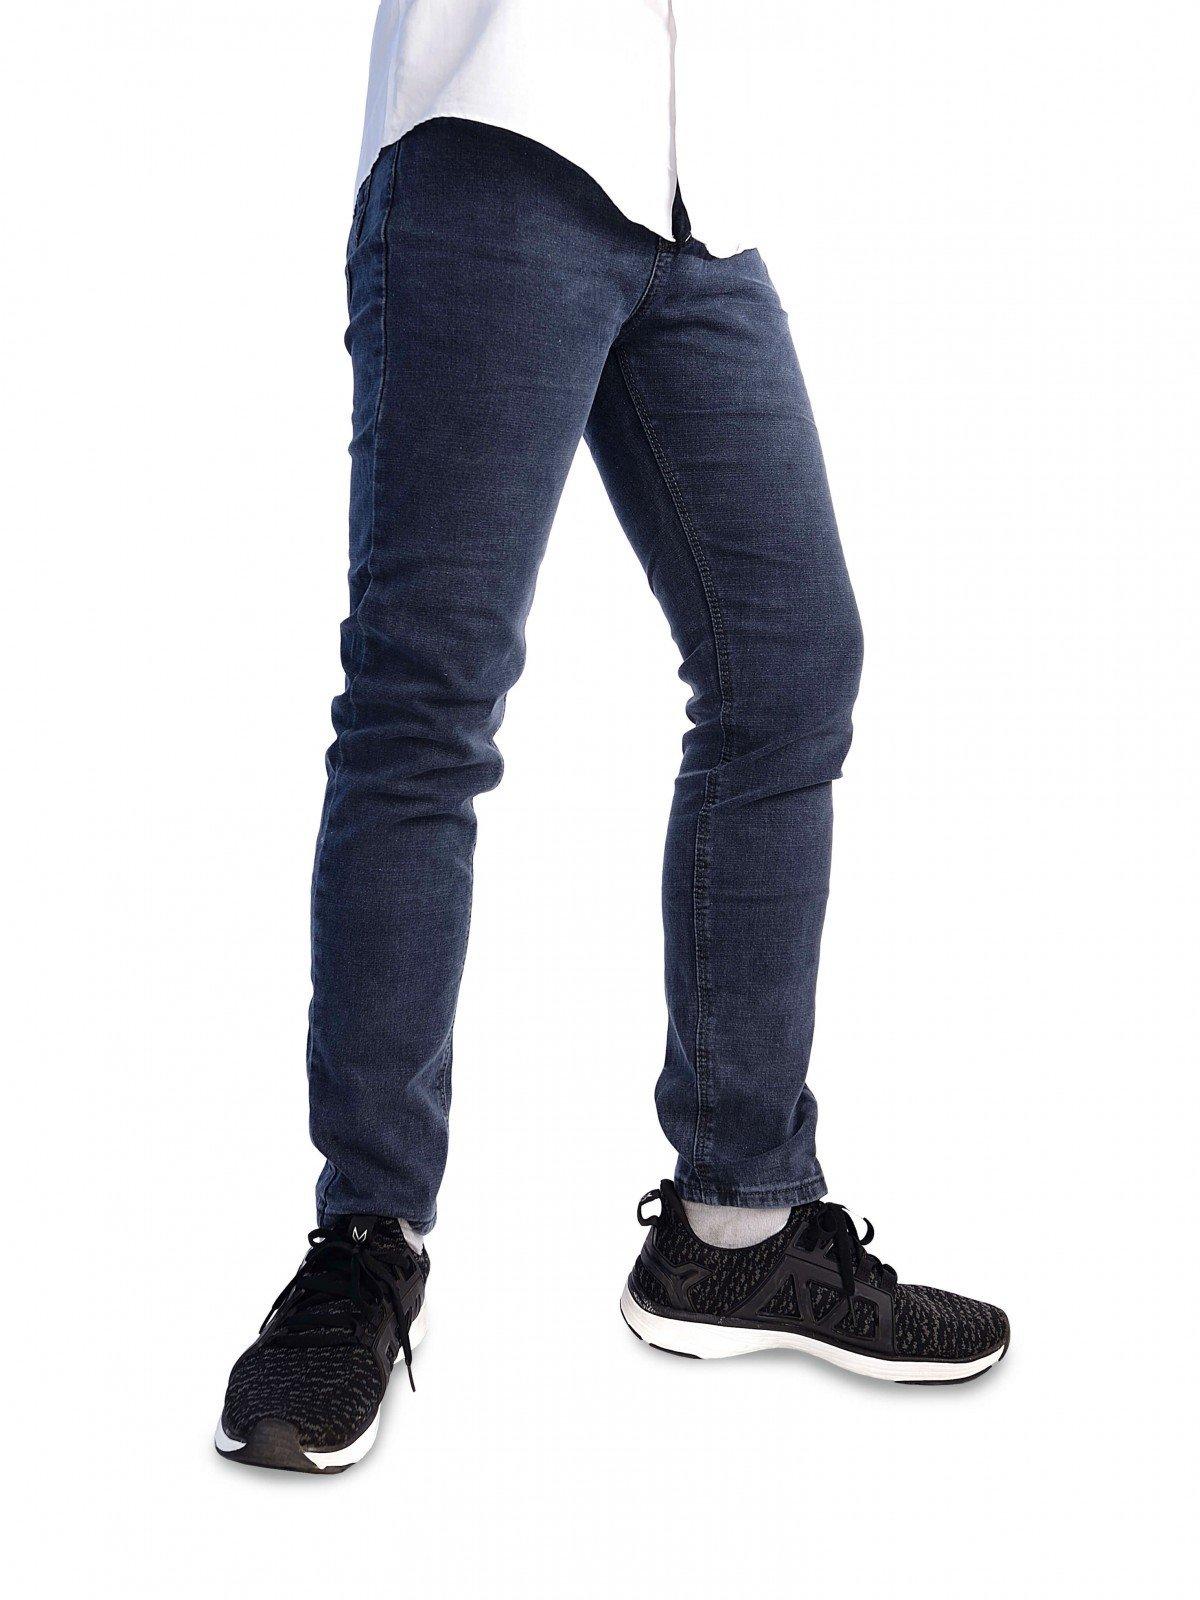 quan jeans nam skinny tphcm